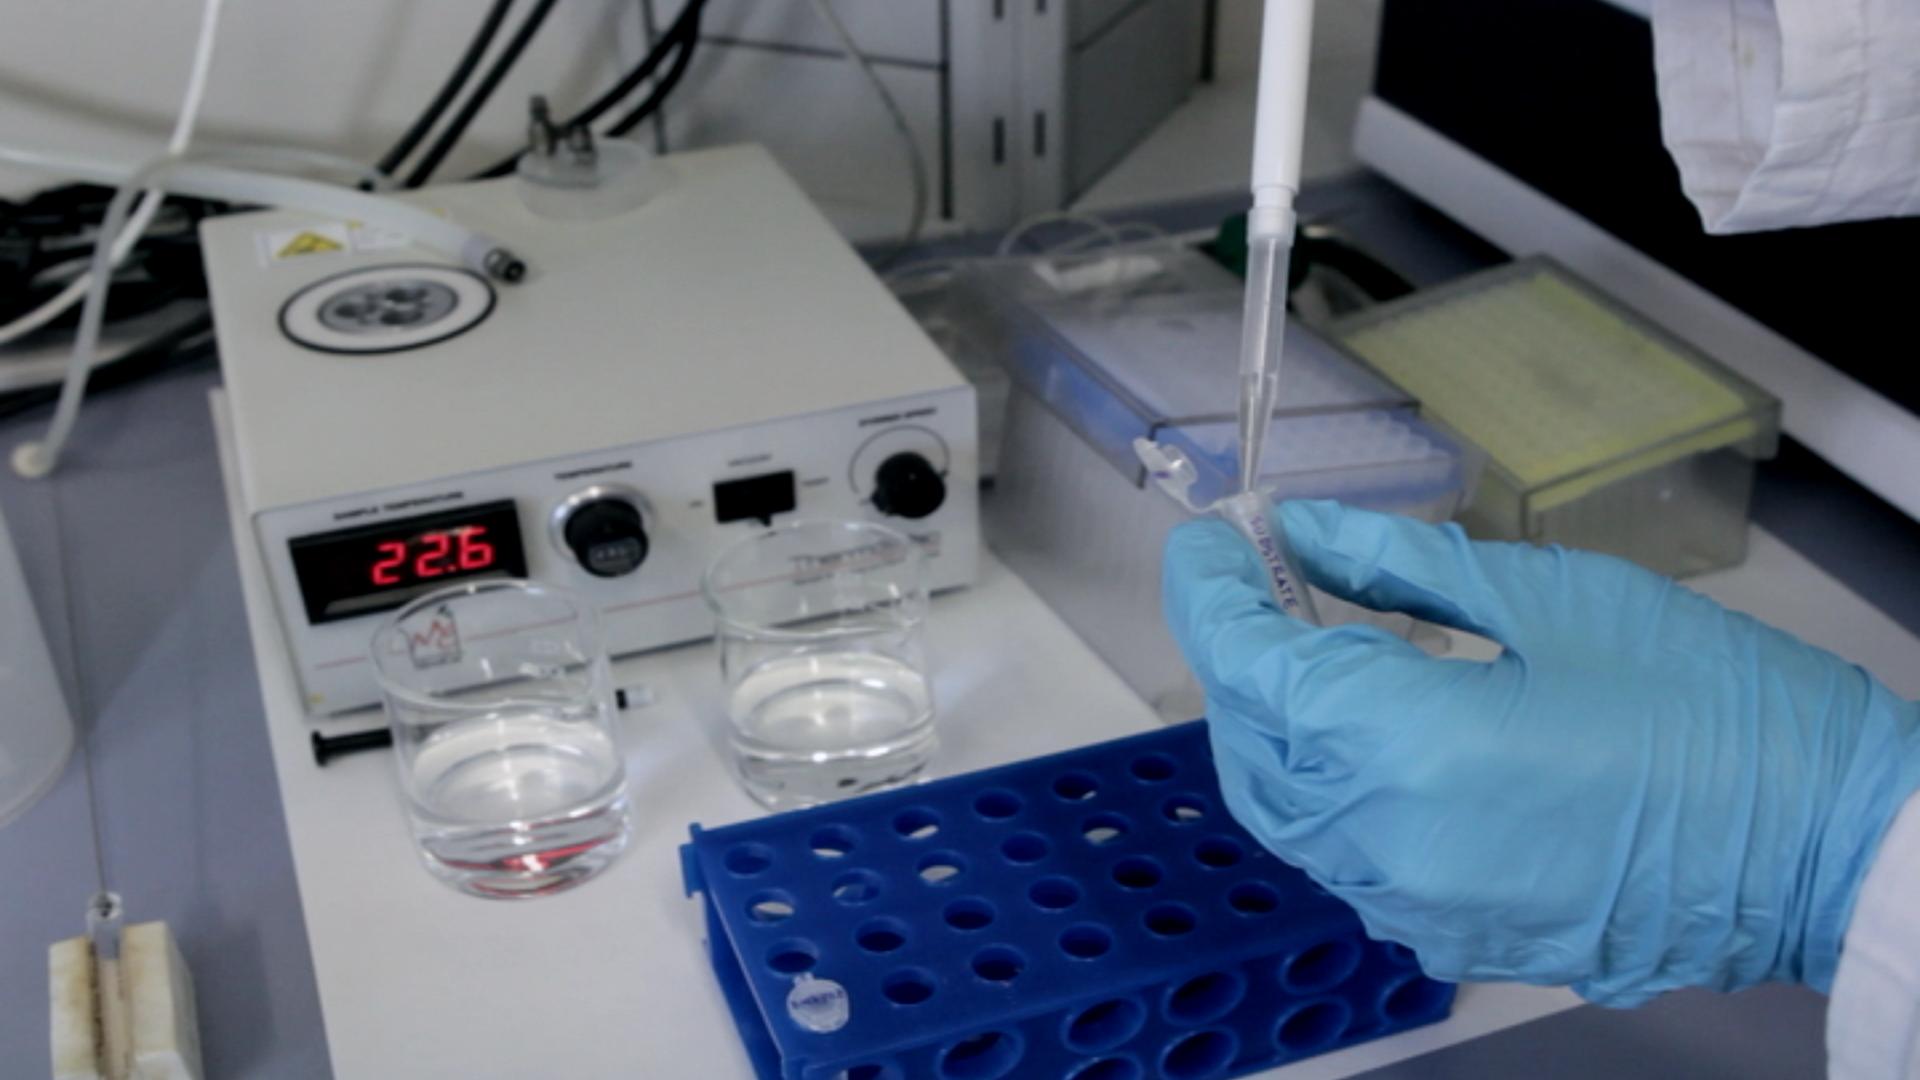 Hot Biologische Katalyse: Isotherme Titrationskalorimetrie zu Enzymreaktionen Charakterisieren